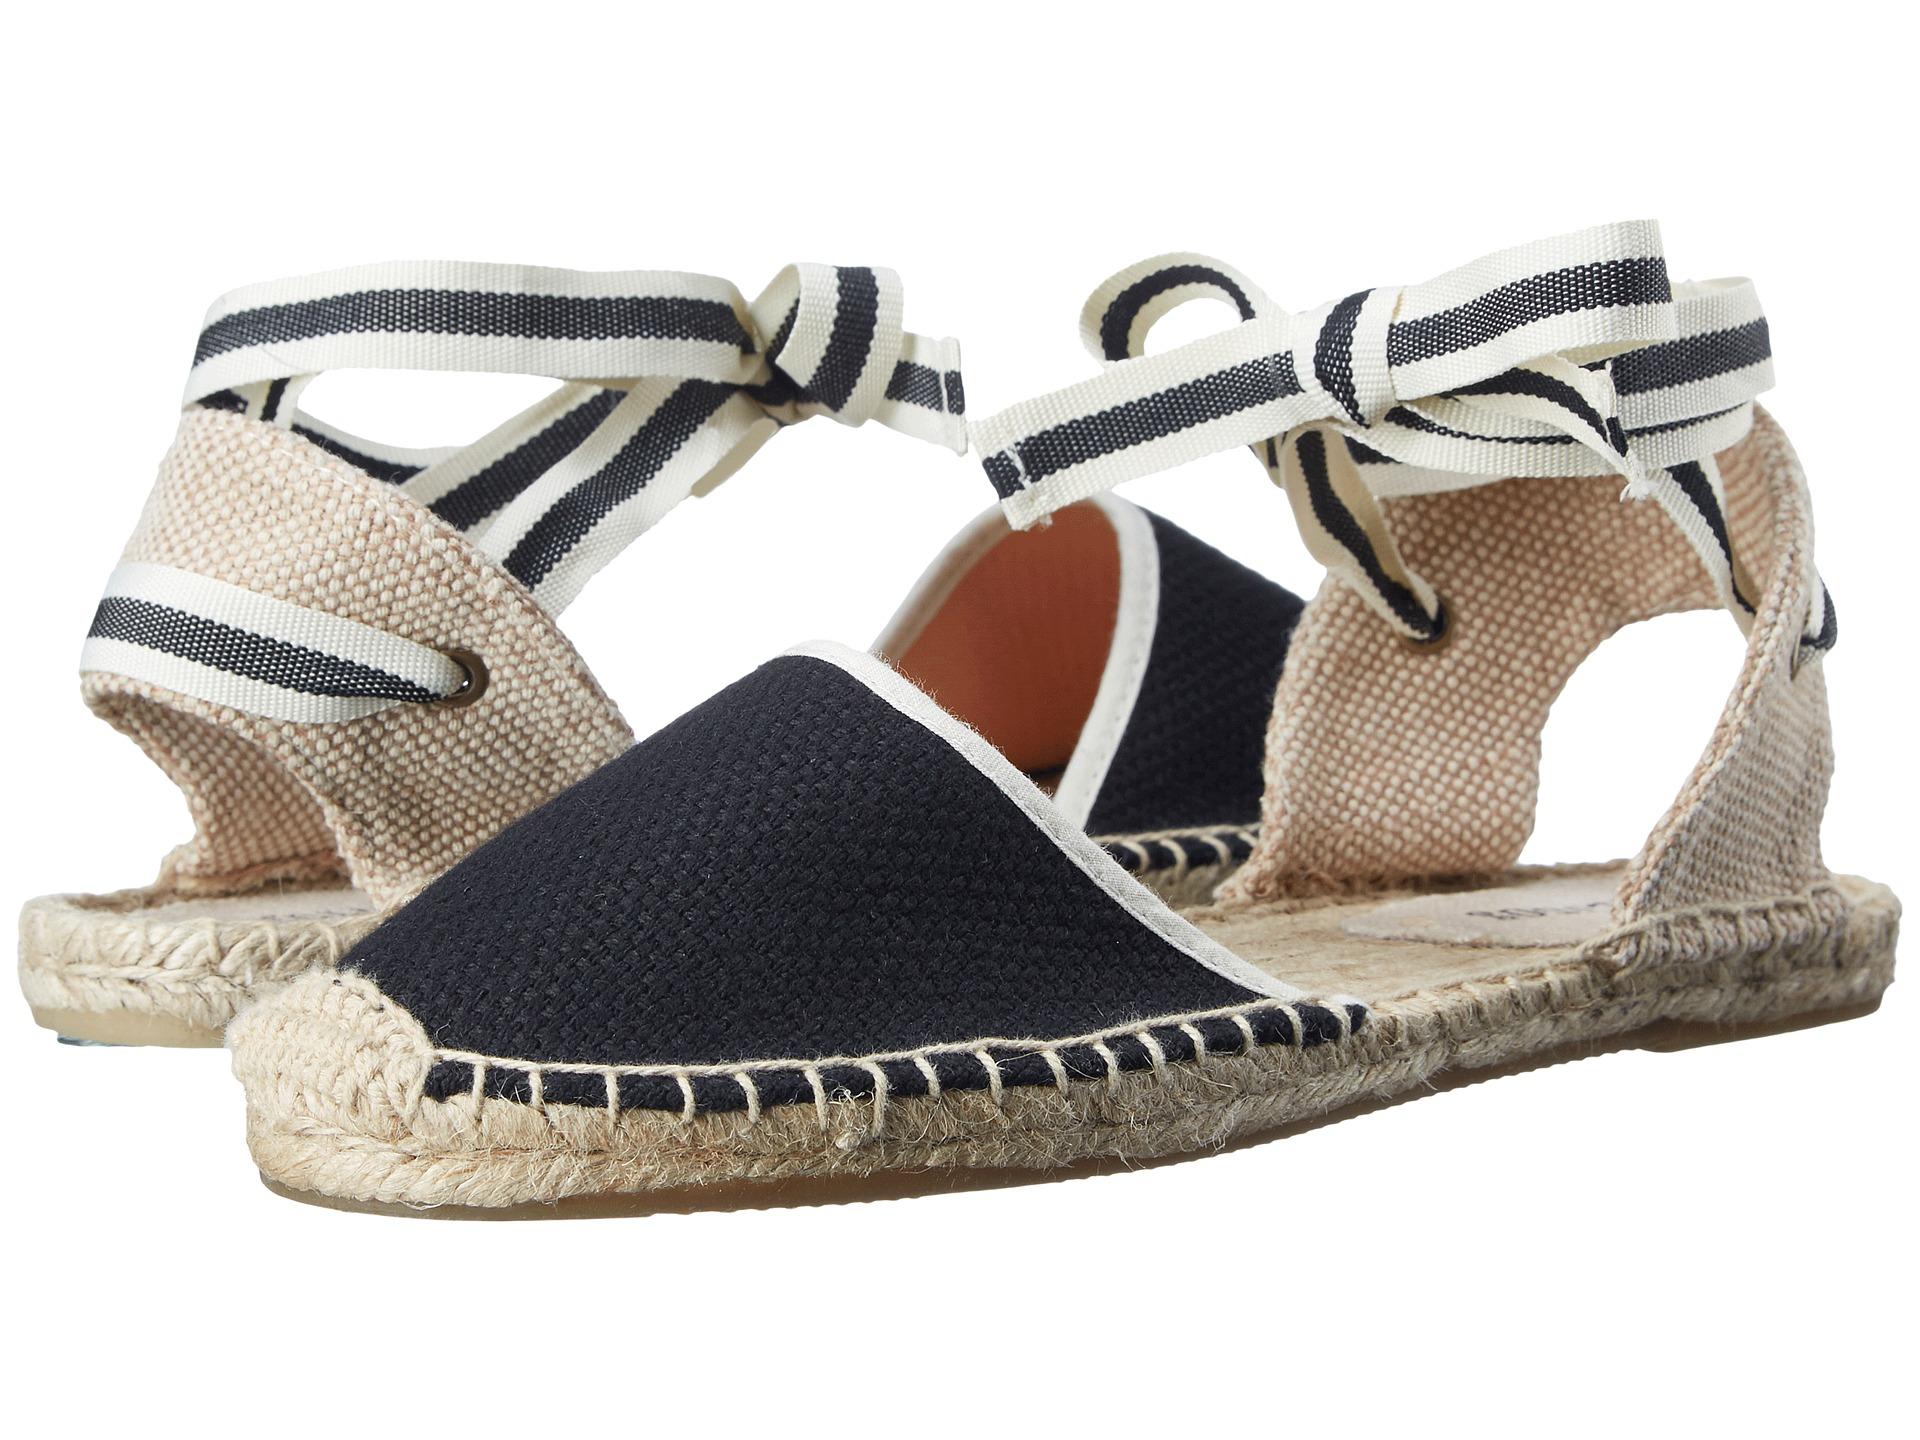 Soludos Classic Sandal at Zappos.com